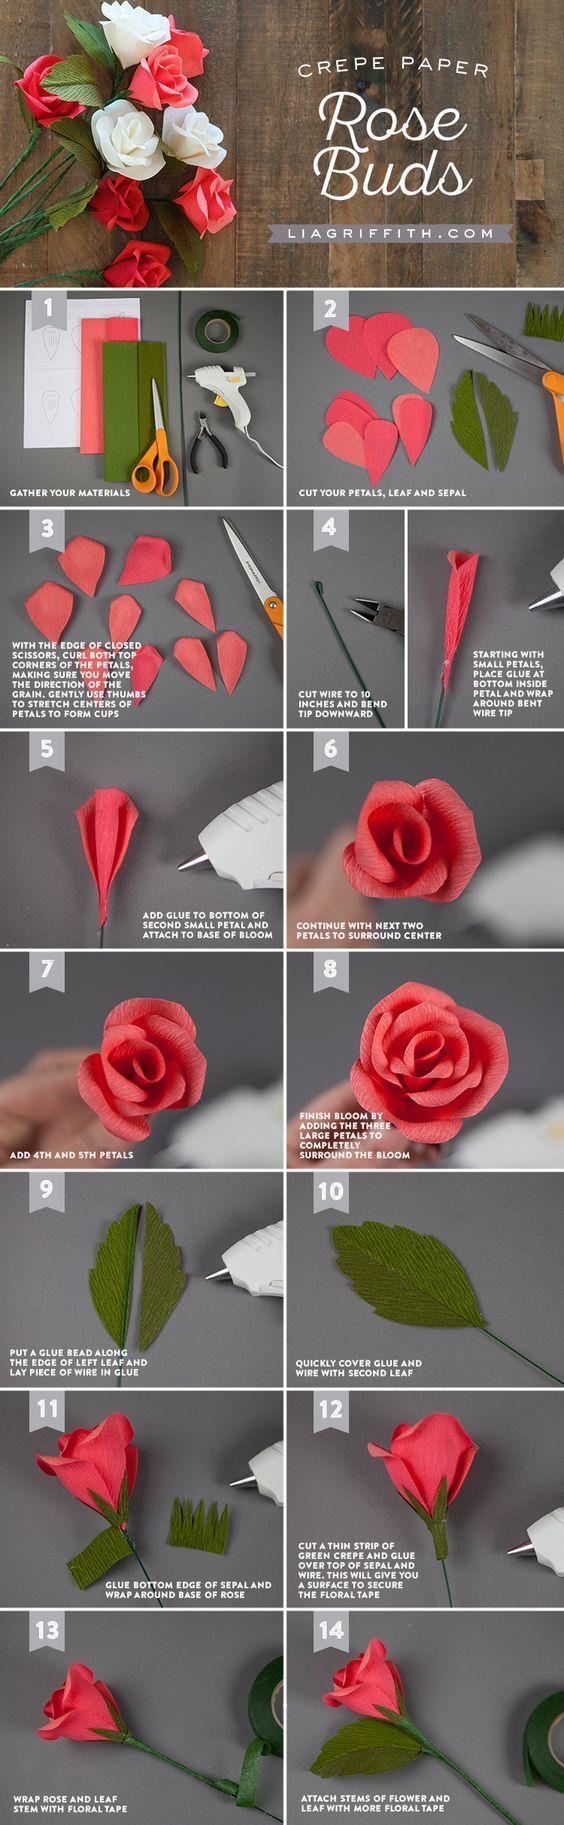 Handmade Crepe Paper Rose Buds Tutorial How To Make